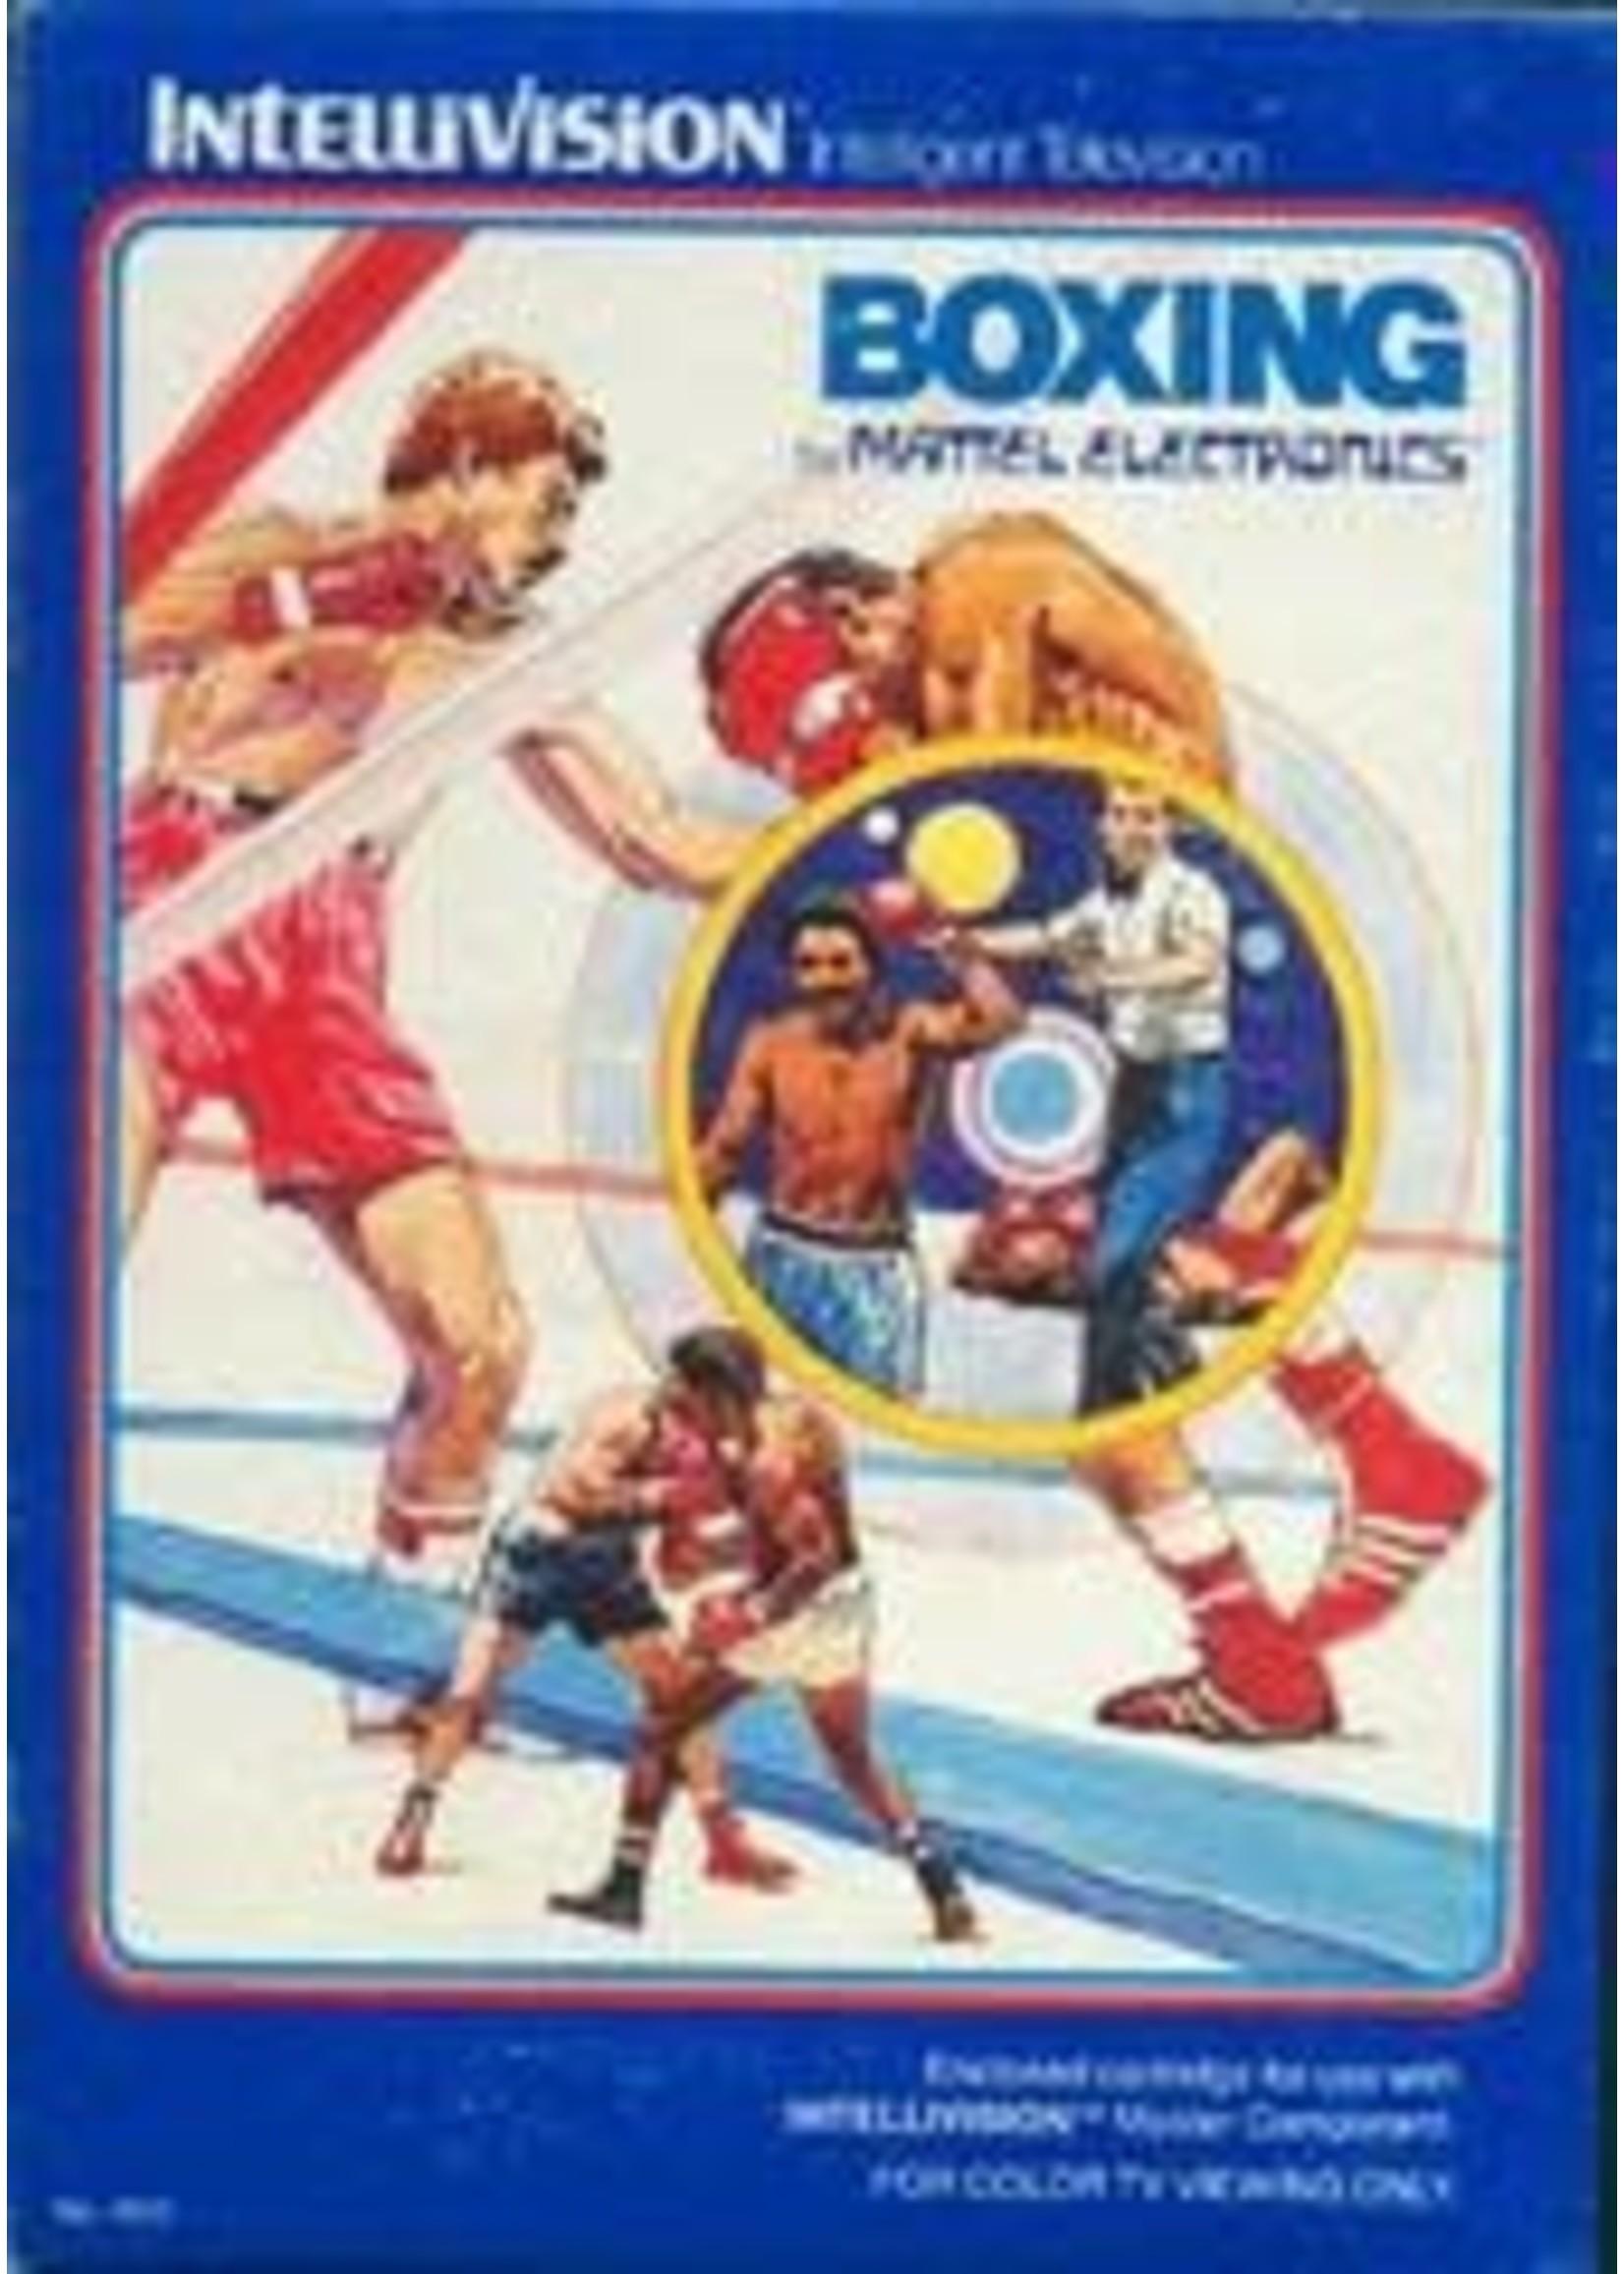 Boxing Intellivision